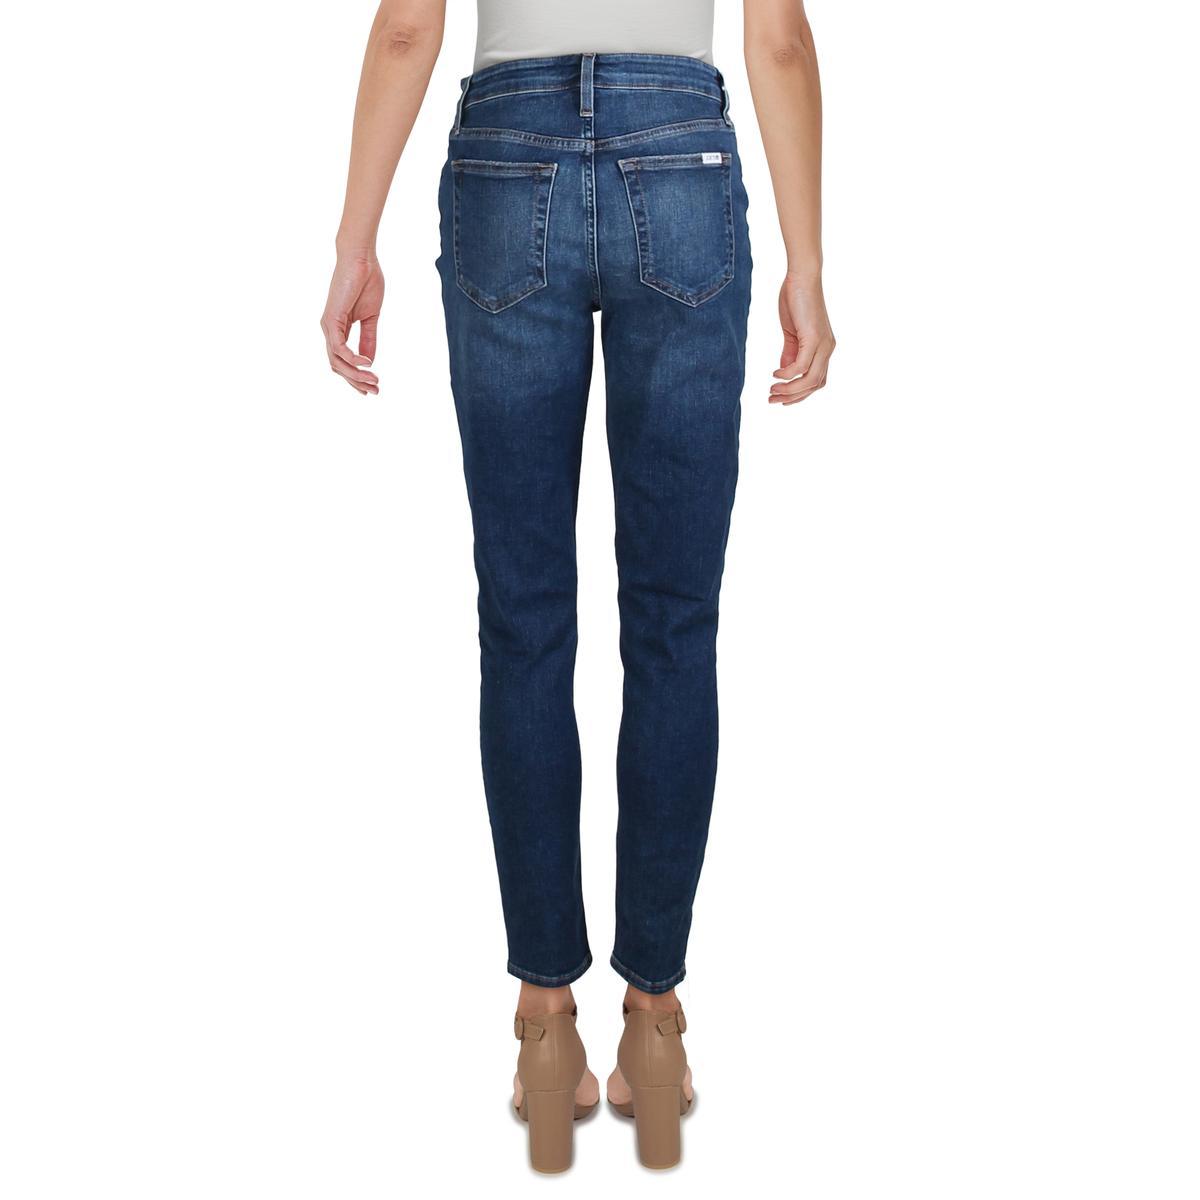 Joe/'s Womens The Charlie  Animal High Rise Denim Ankle Jeans BHFO 1553